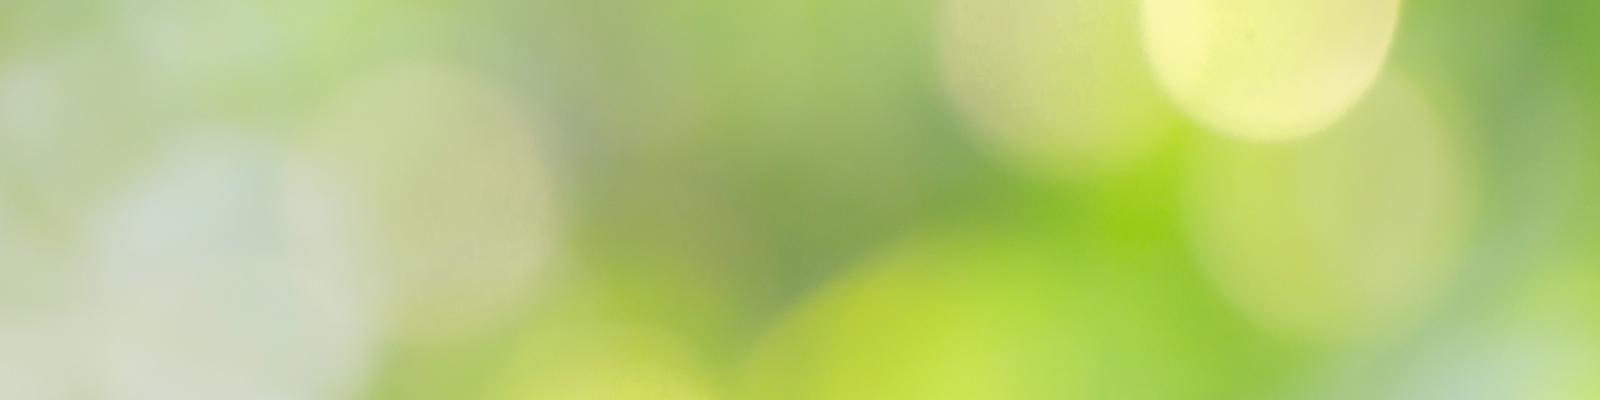 TopBanner-Green